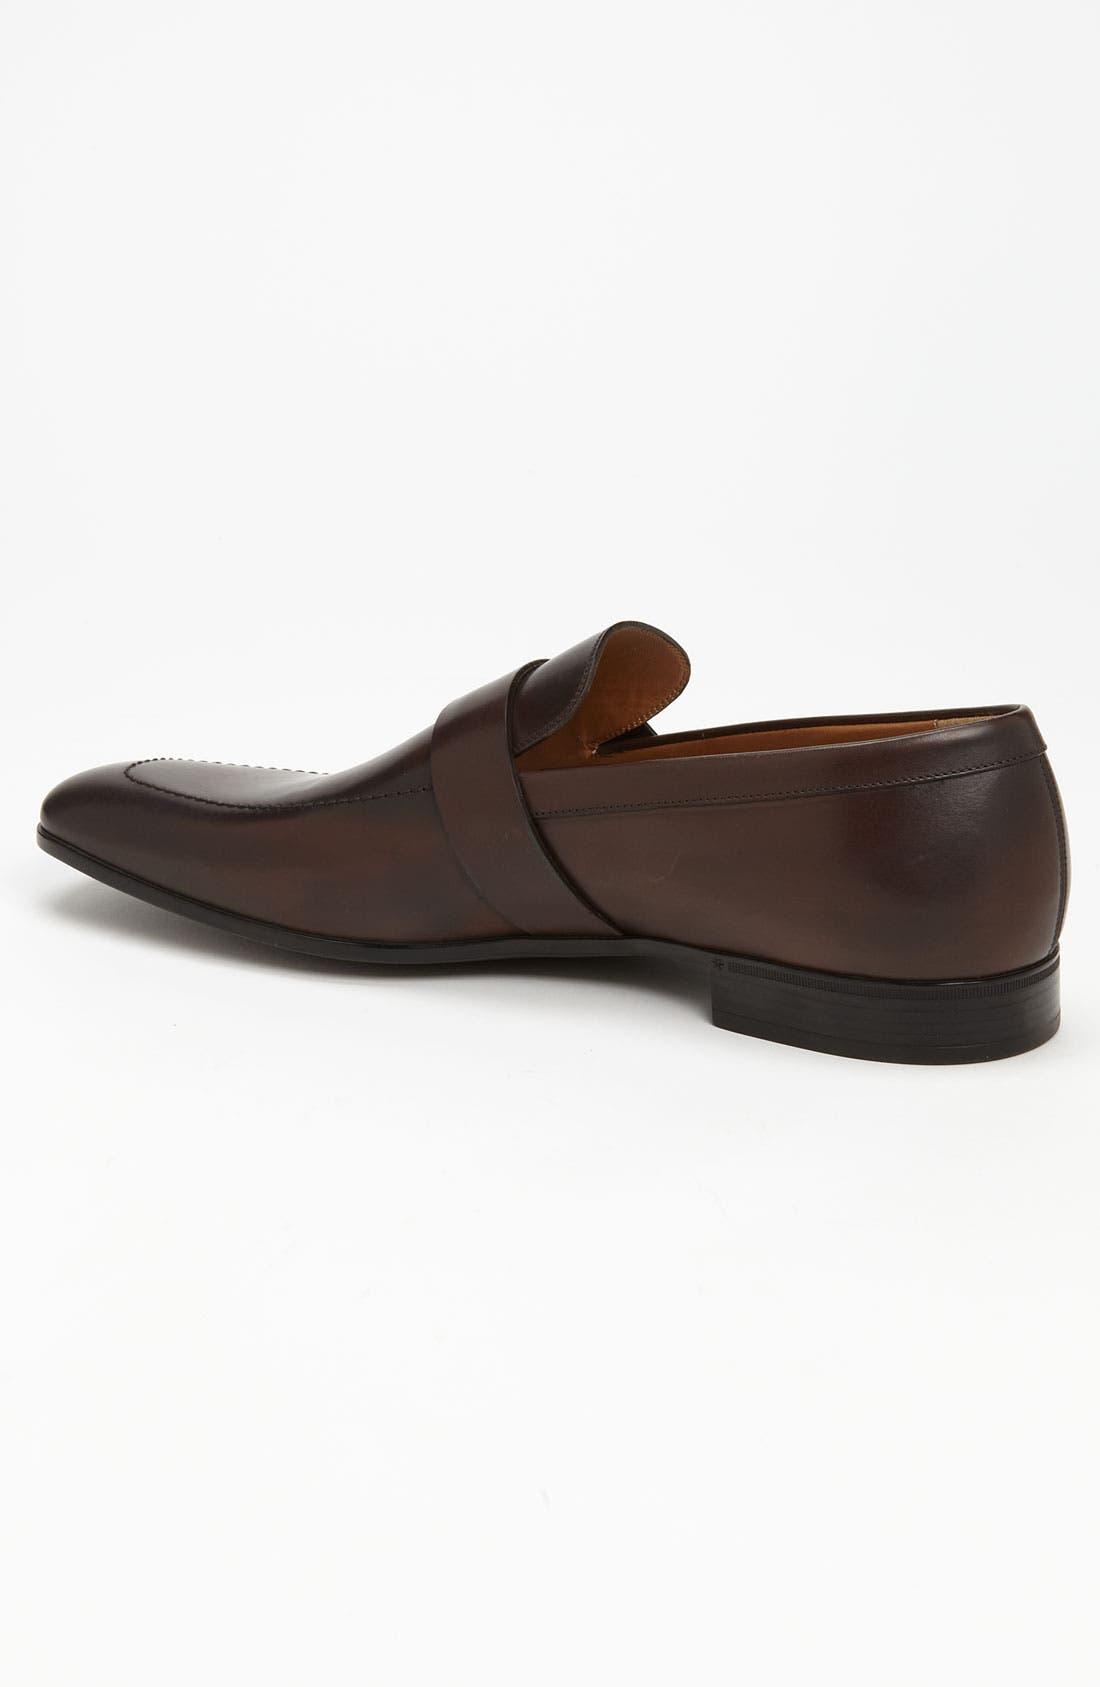 Alternate Image 2  - Gucci 'Dynamics' Loafer